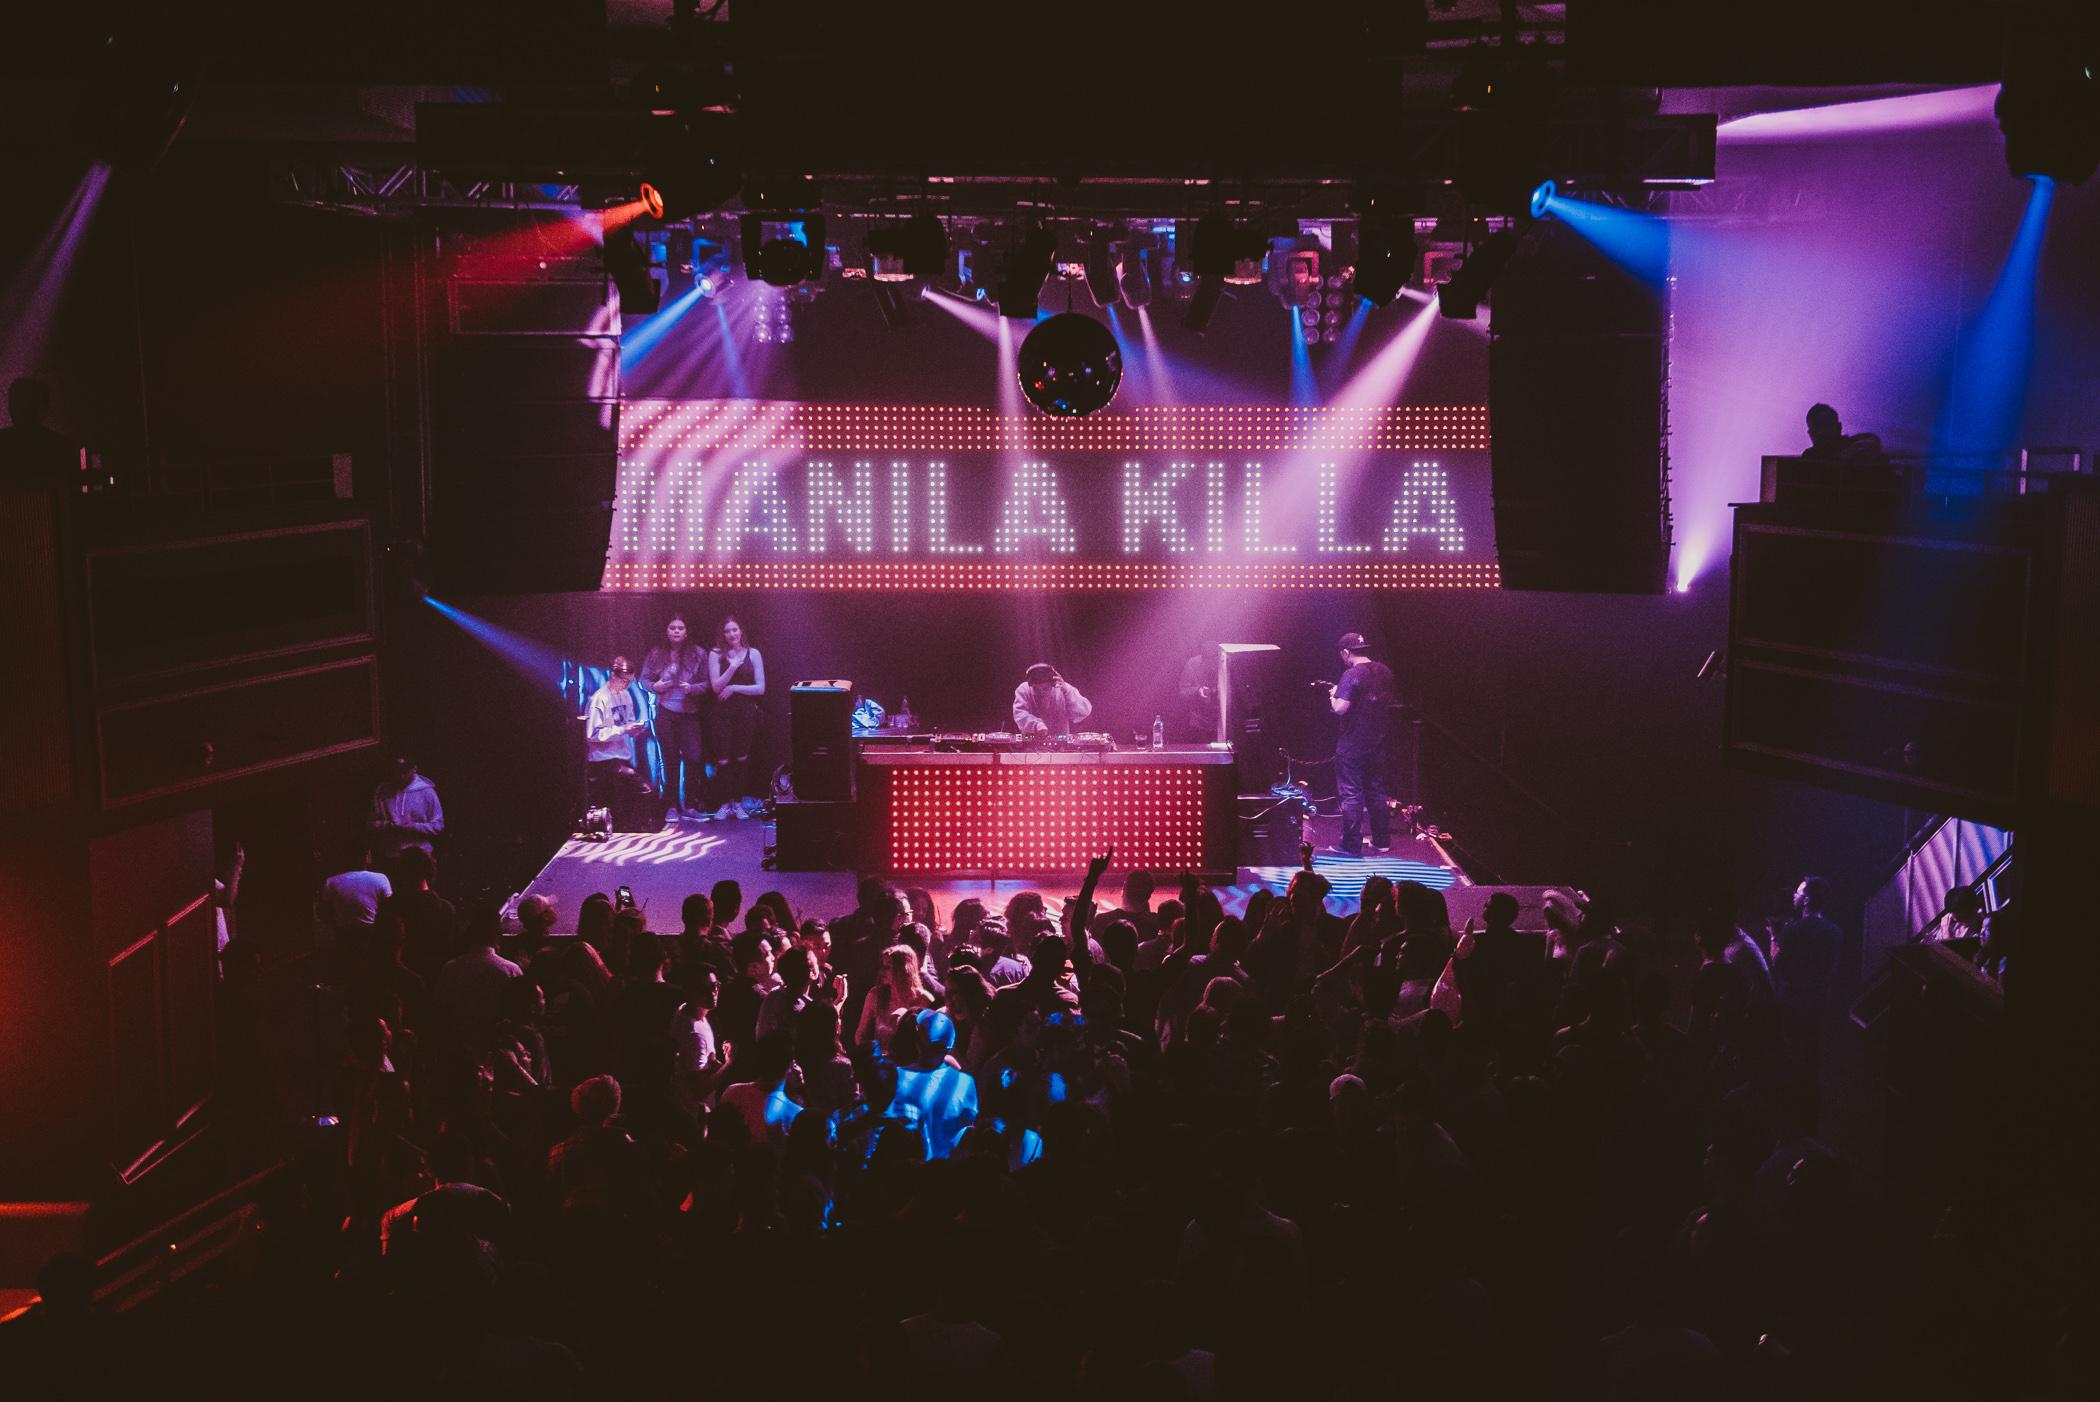 1_Manila_Killa-VENUE_Timothy_Nguyen-20180331 (3 of 9).jpg